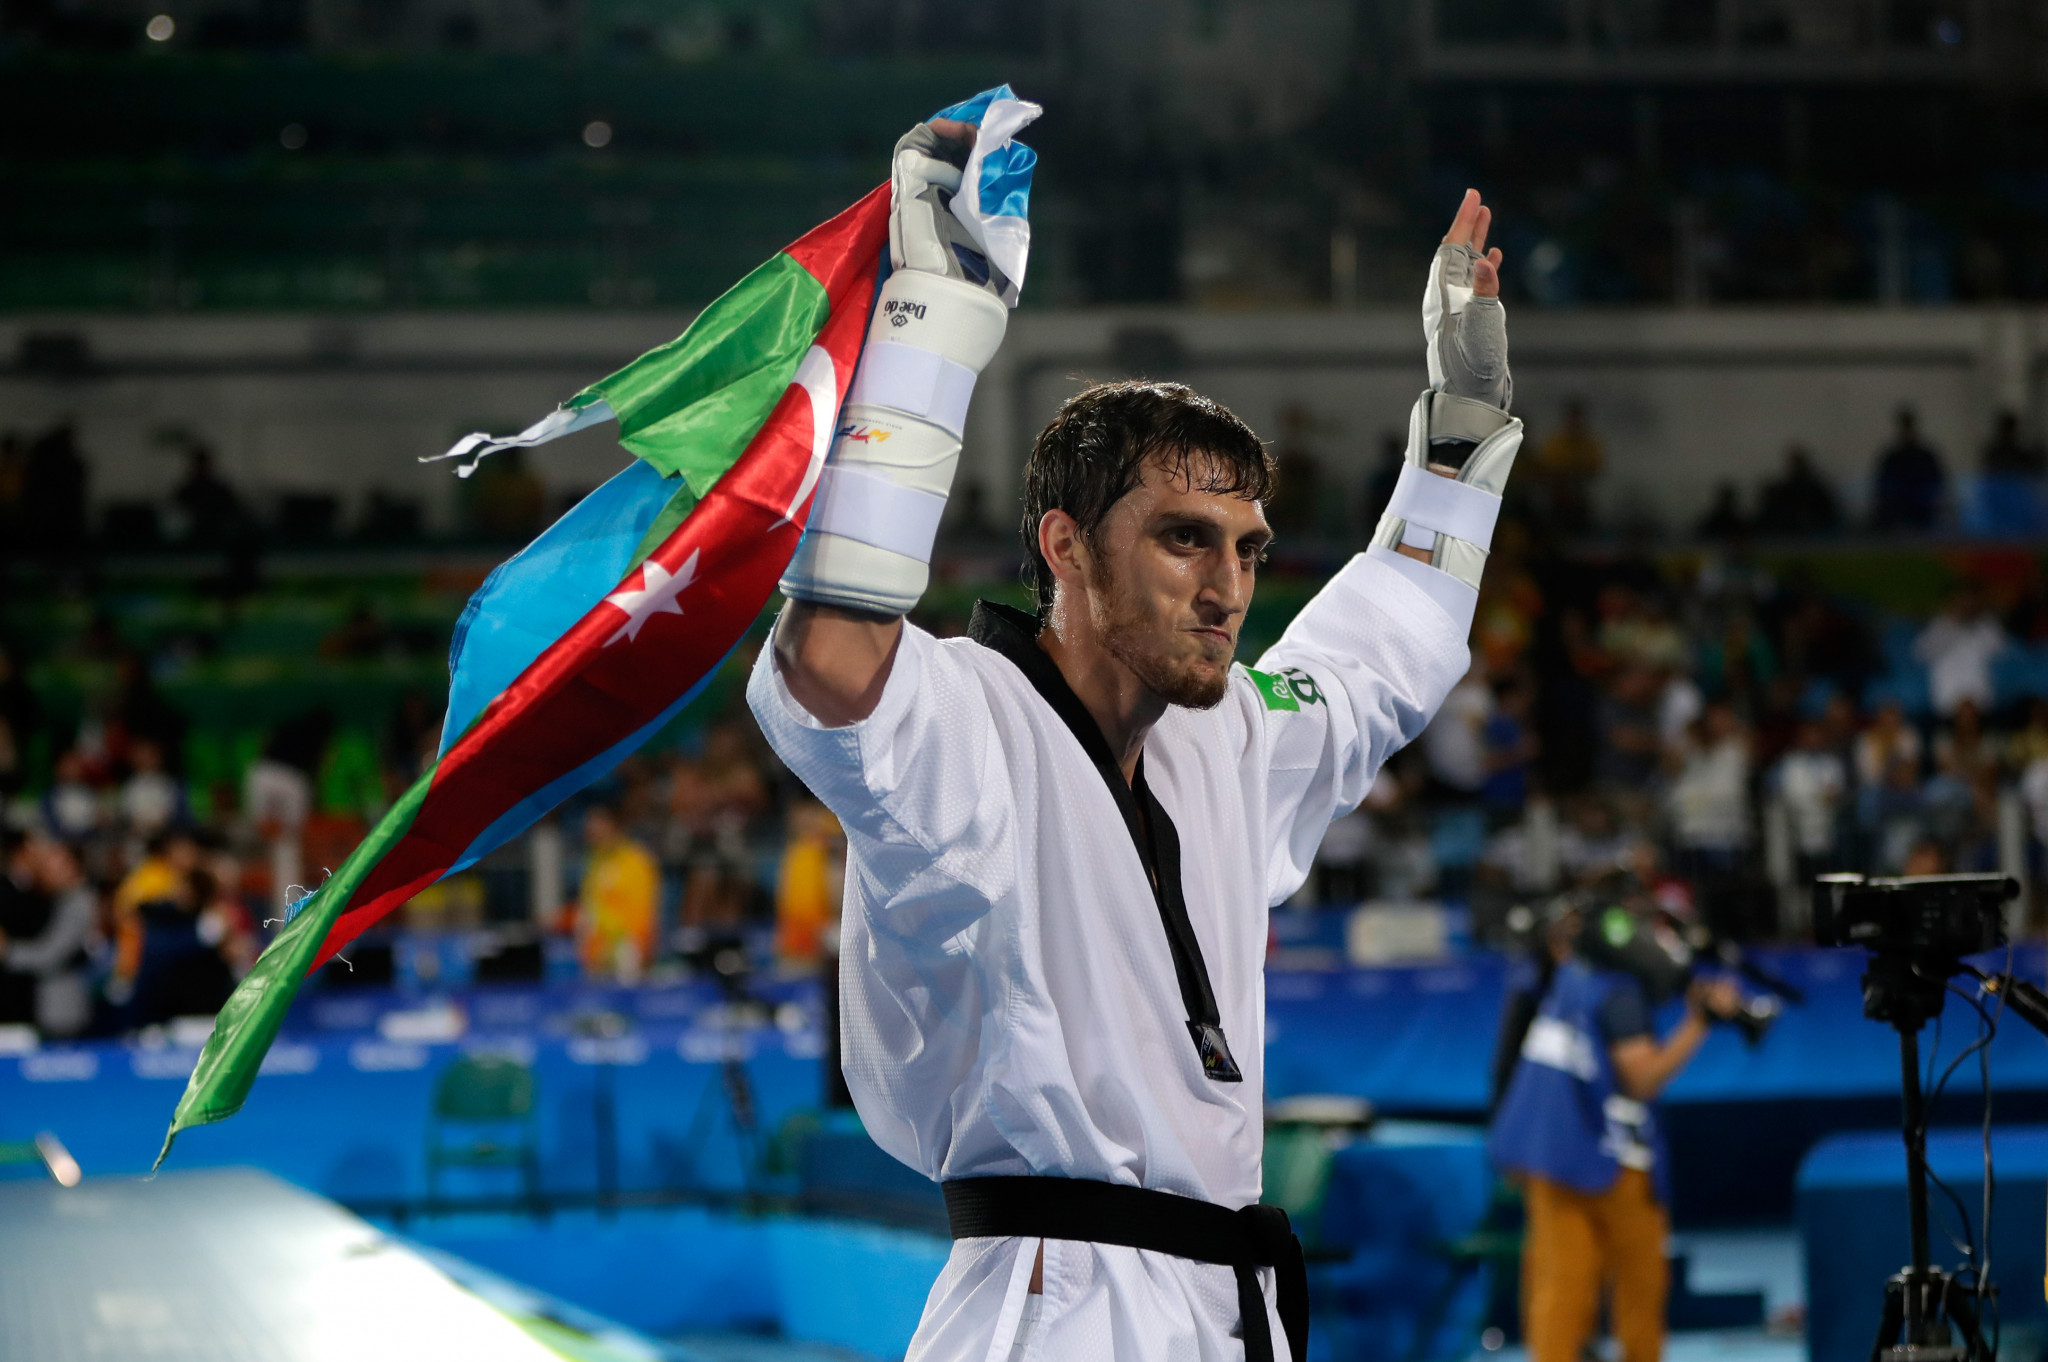 Radik Isayev won Olympic gold at Rio 2016 ©Getty Images